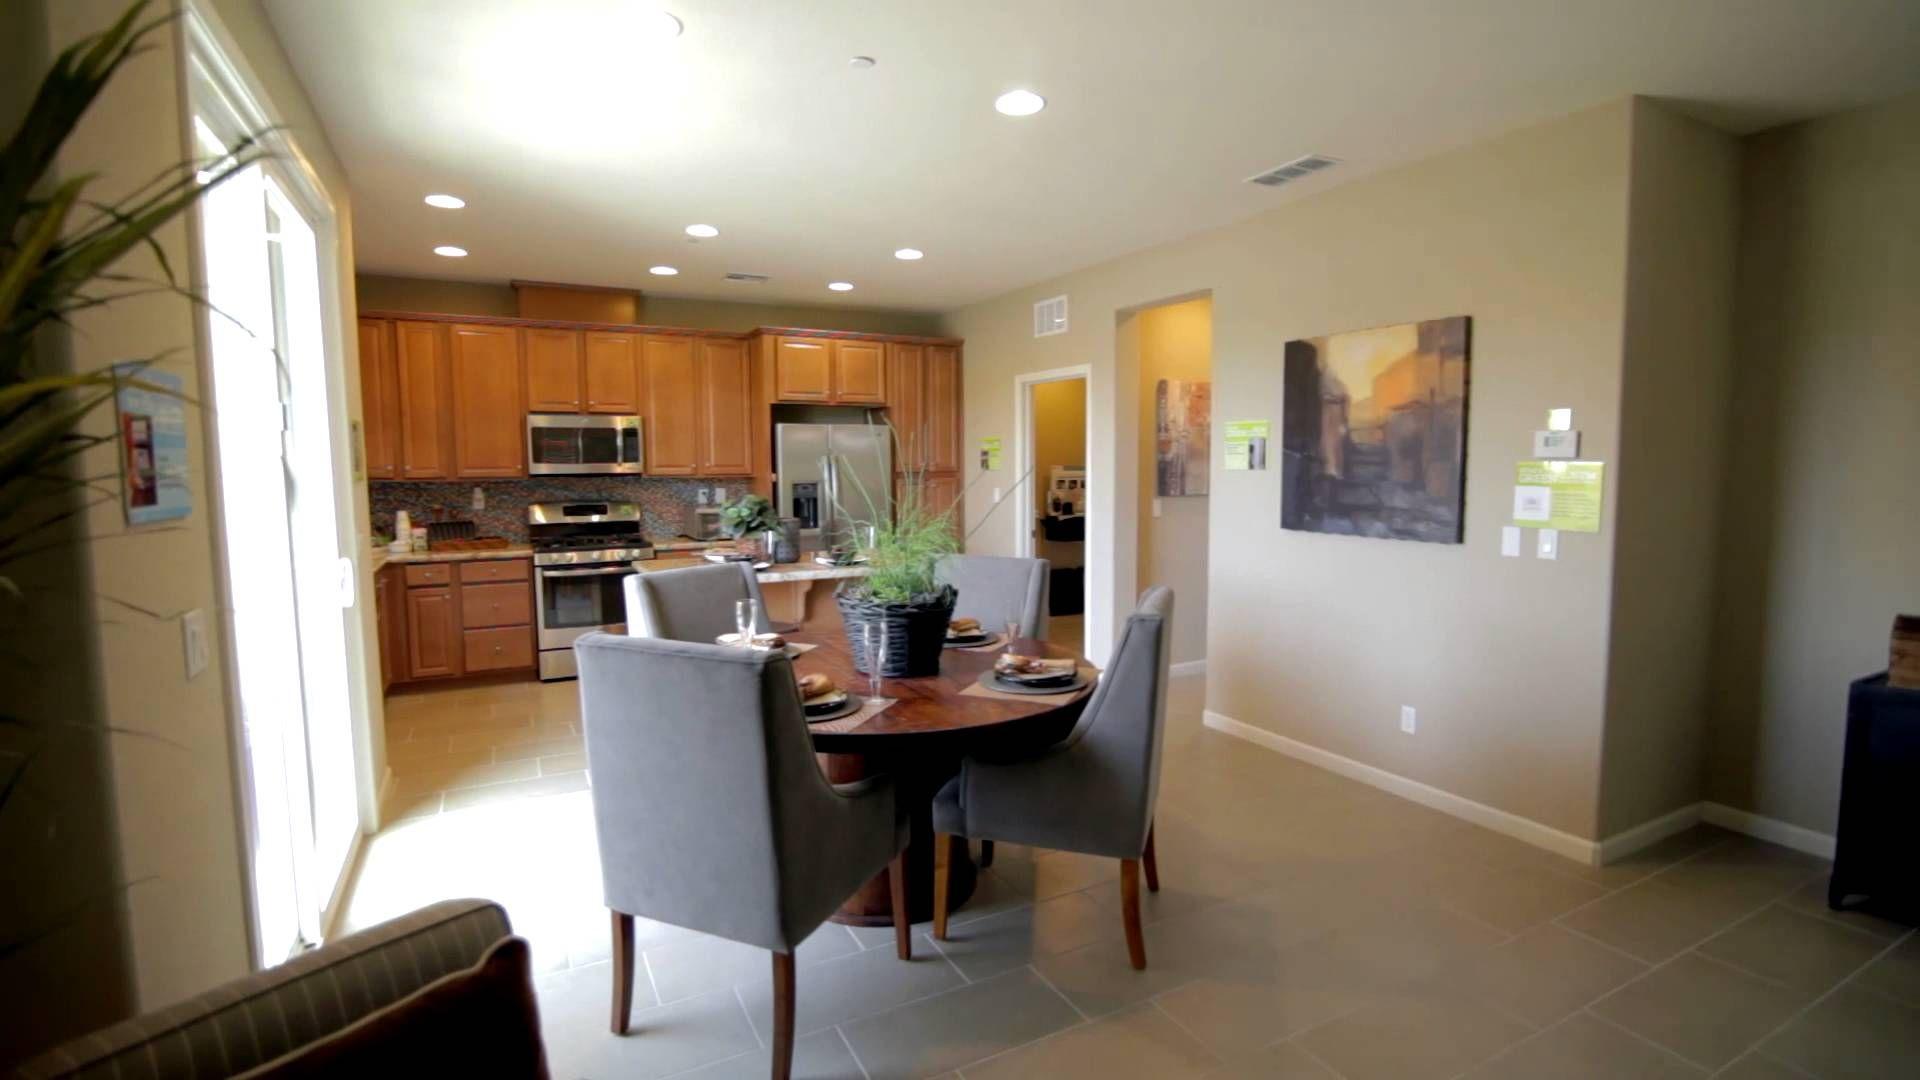 Model home furniture for sale sacramento ca home and house decor